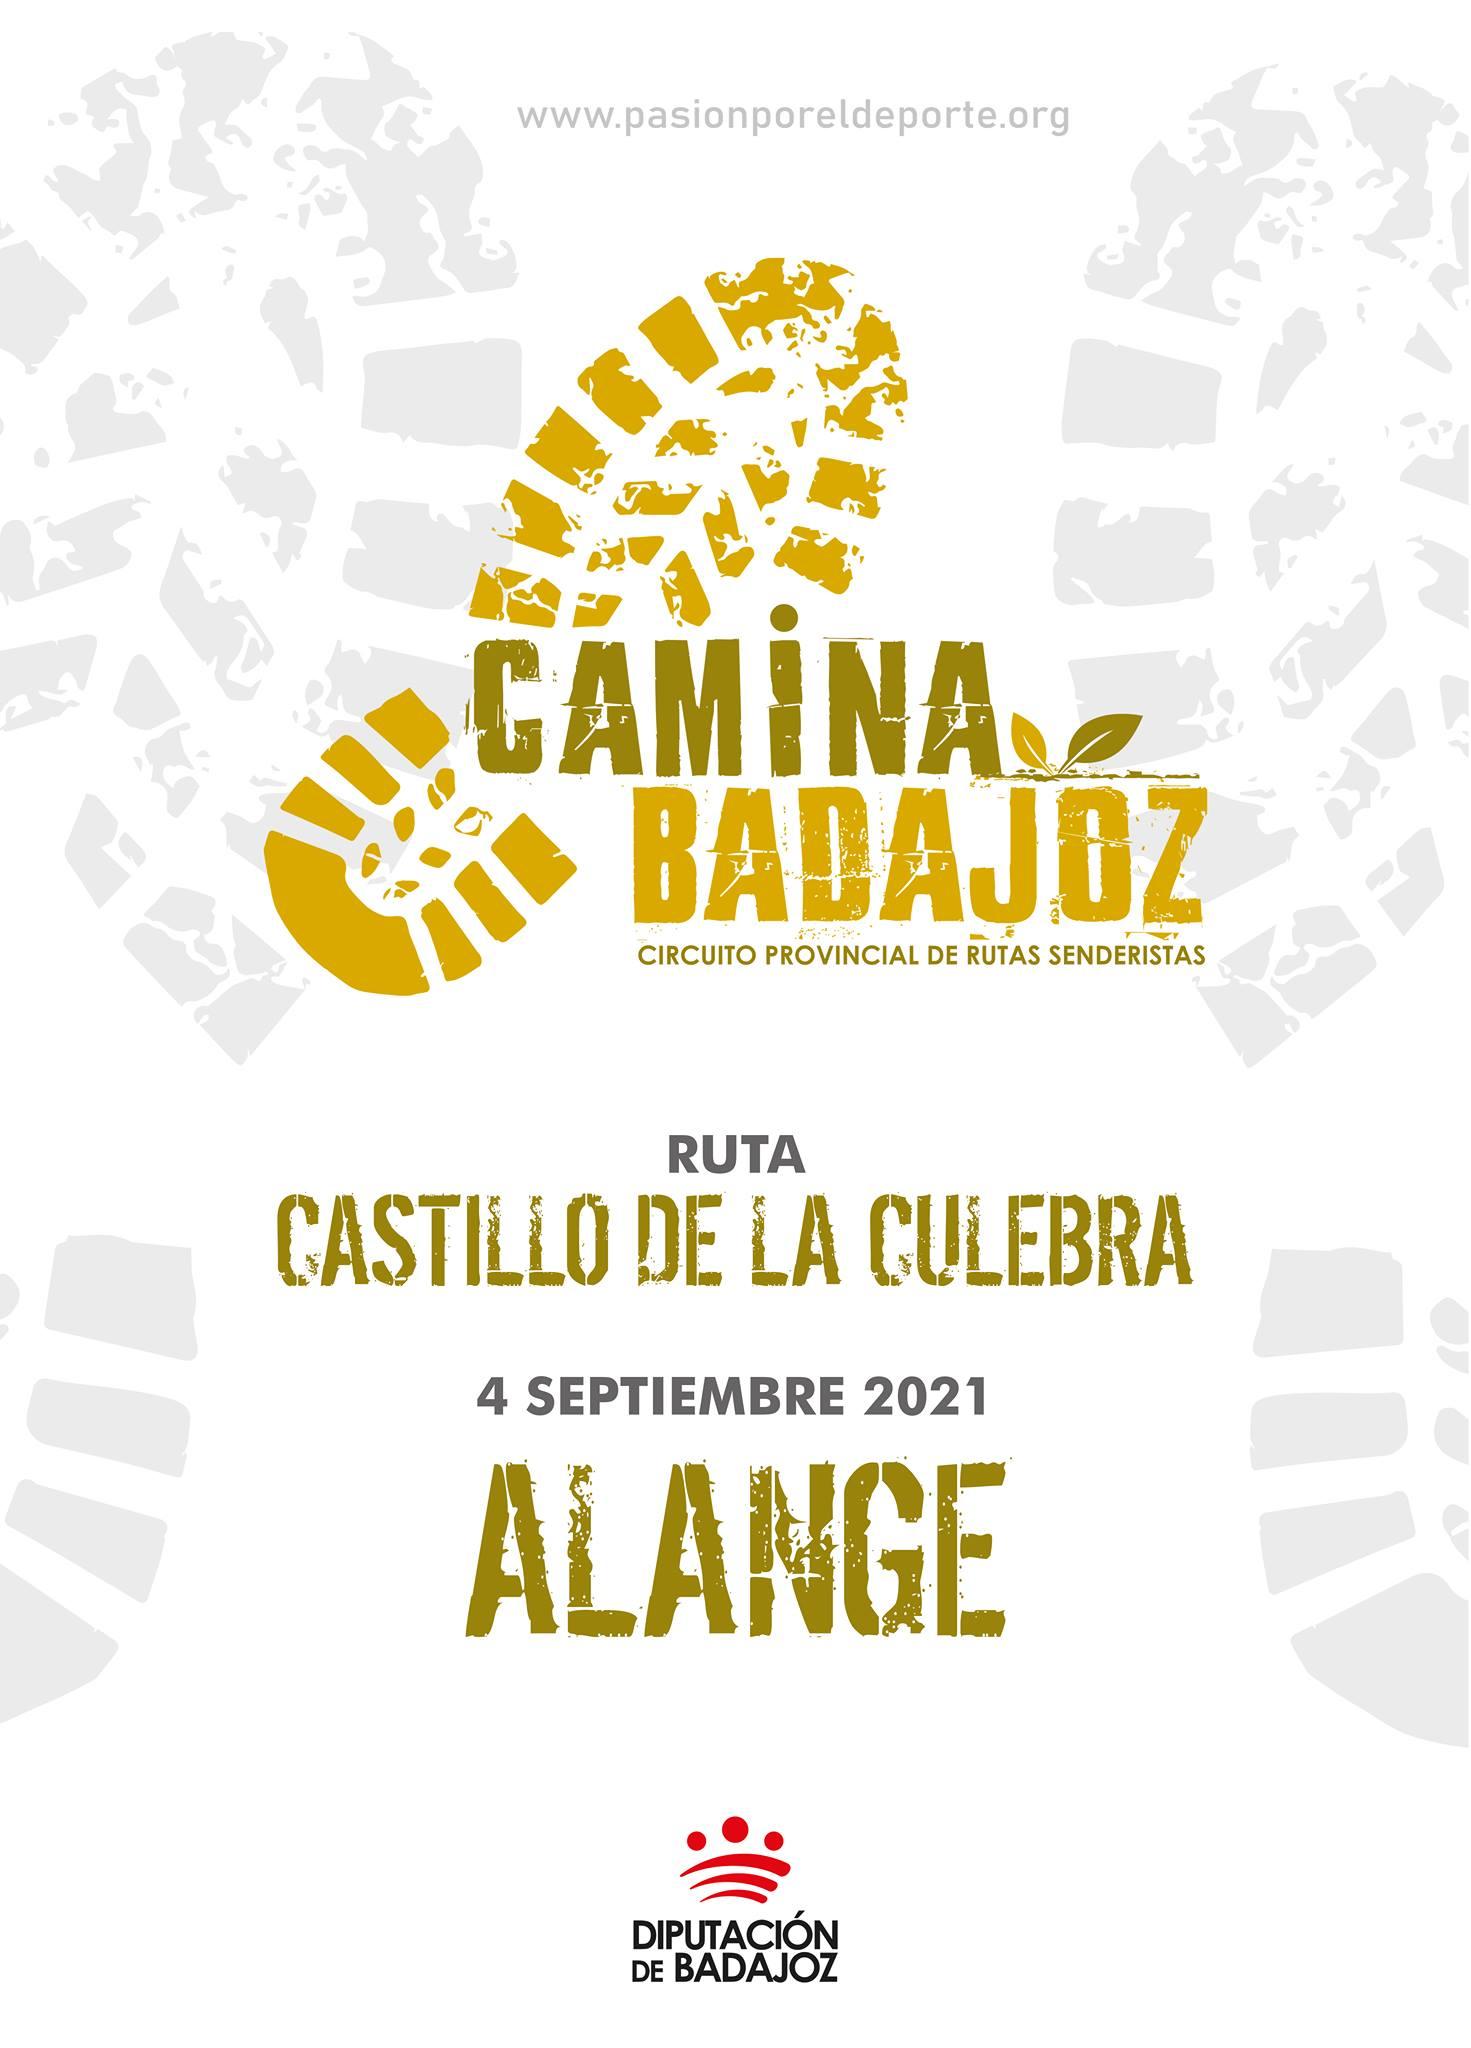 CAMINA BADAJOZ   Ruta Castillo de la Culebra (Alange)